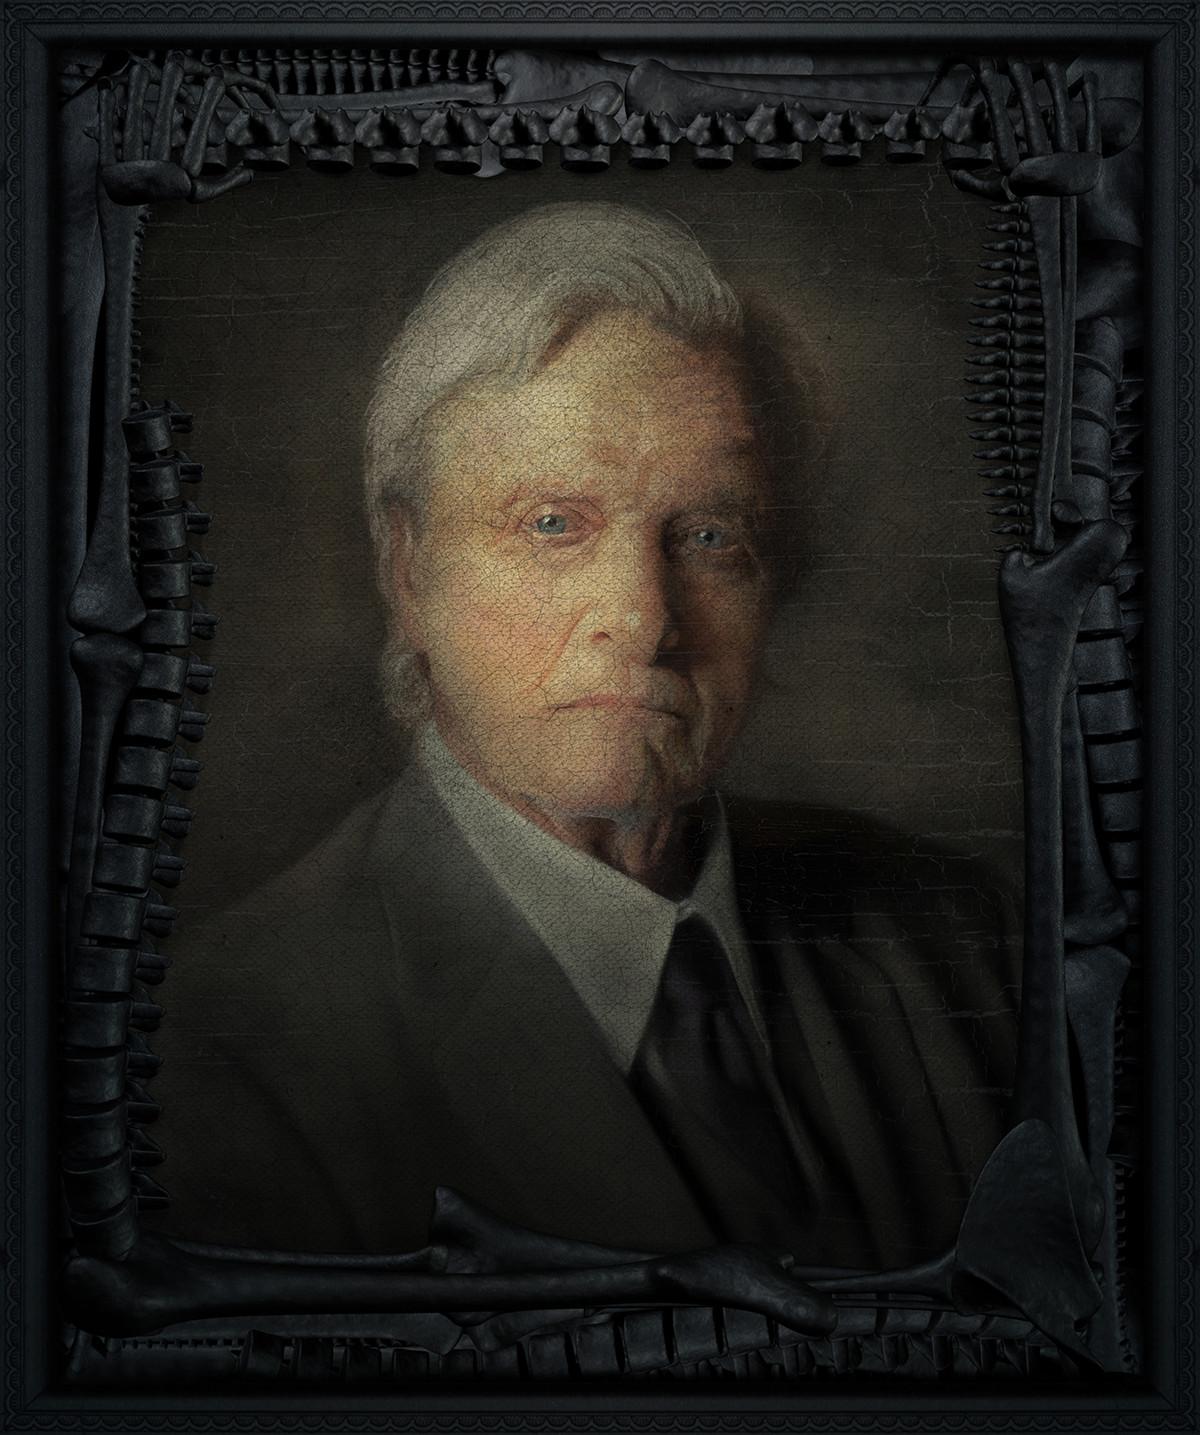 Joseph Peach